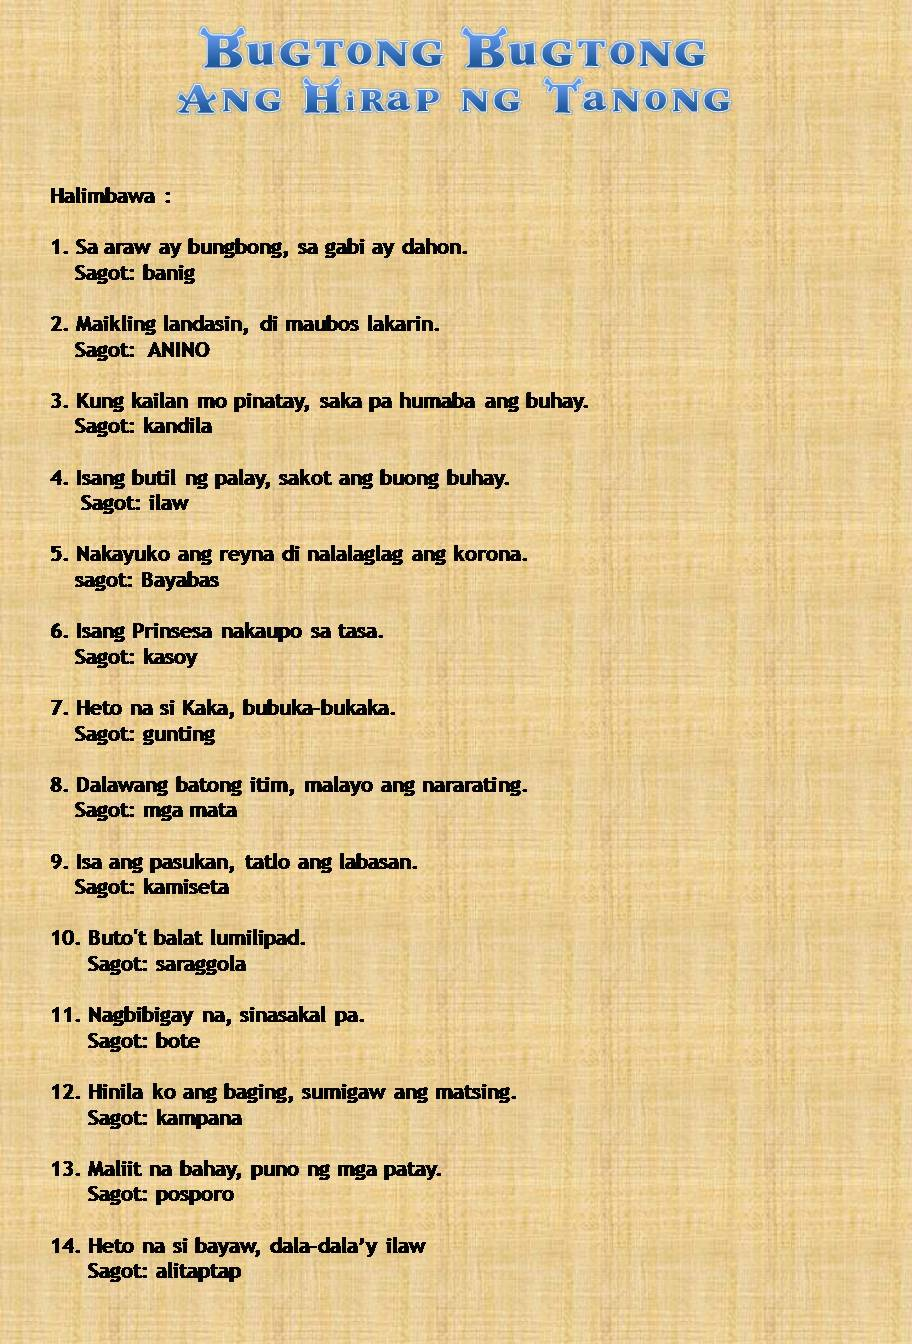 Makatang Pinoy Bugtong